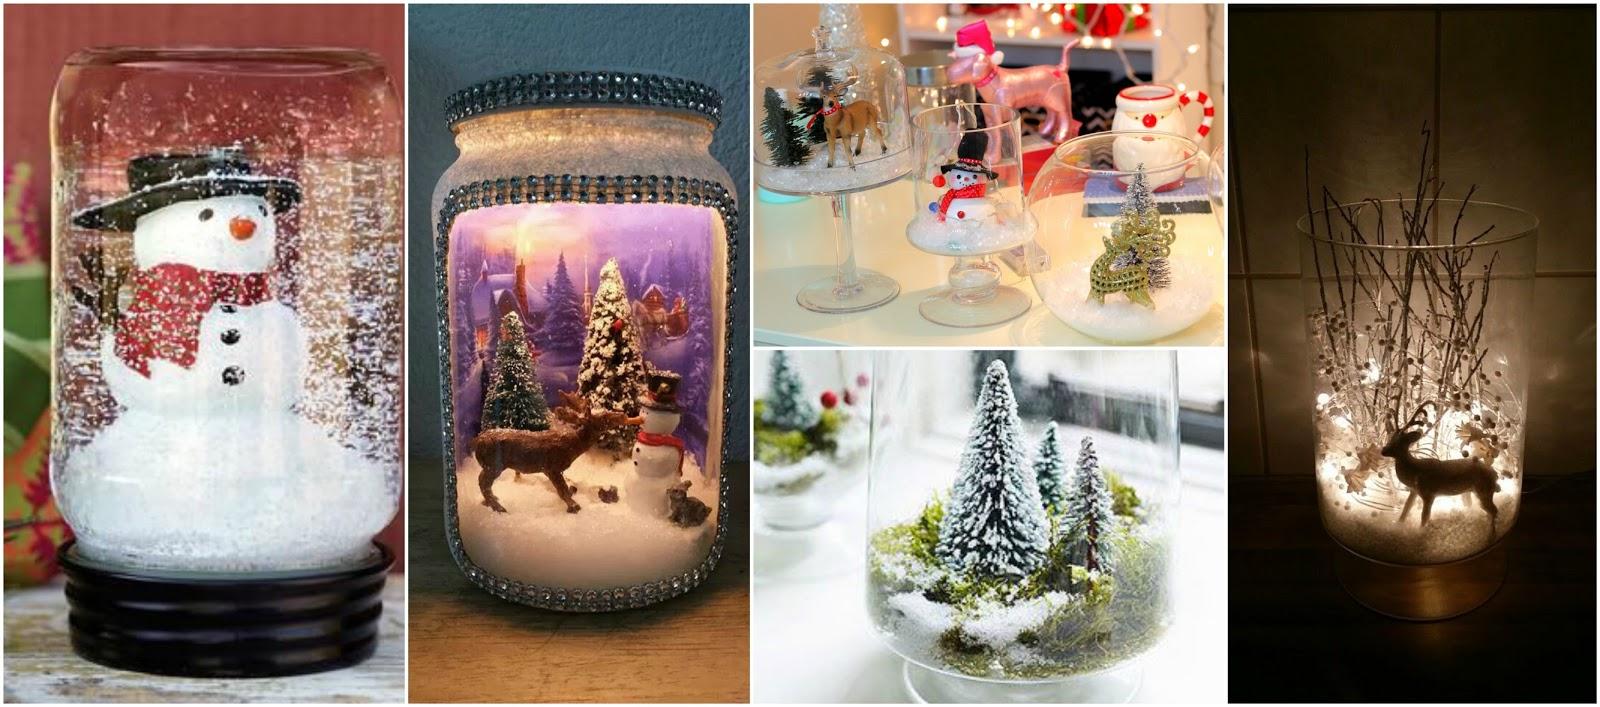 Aprende c mo hacer nieve artificial para hacer adornos - Como hacer centros navidenos ...